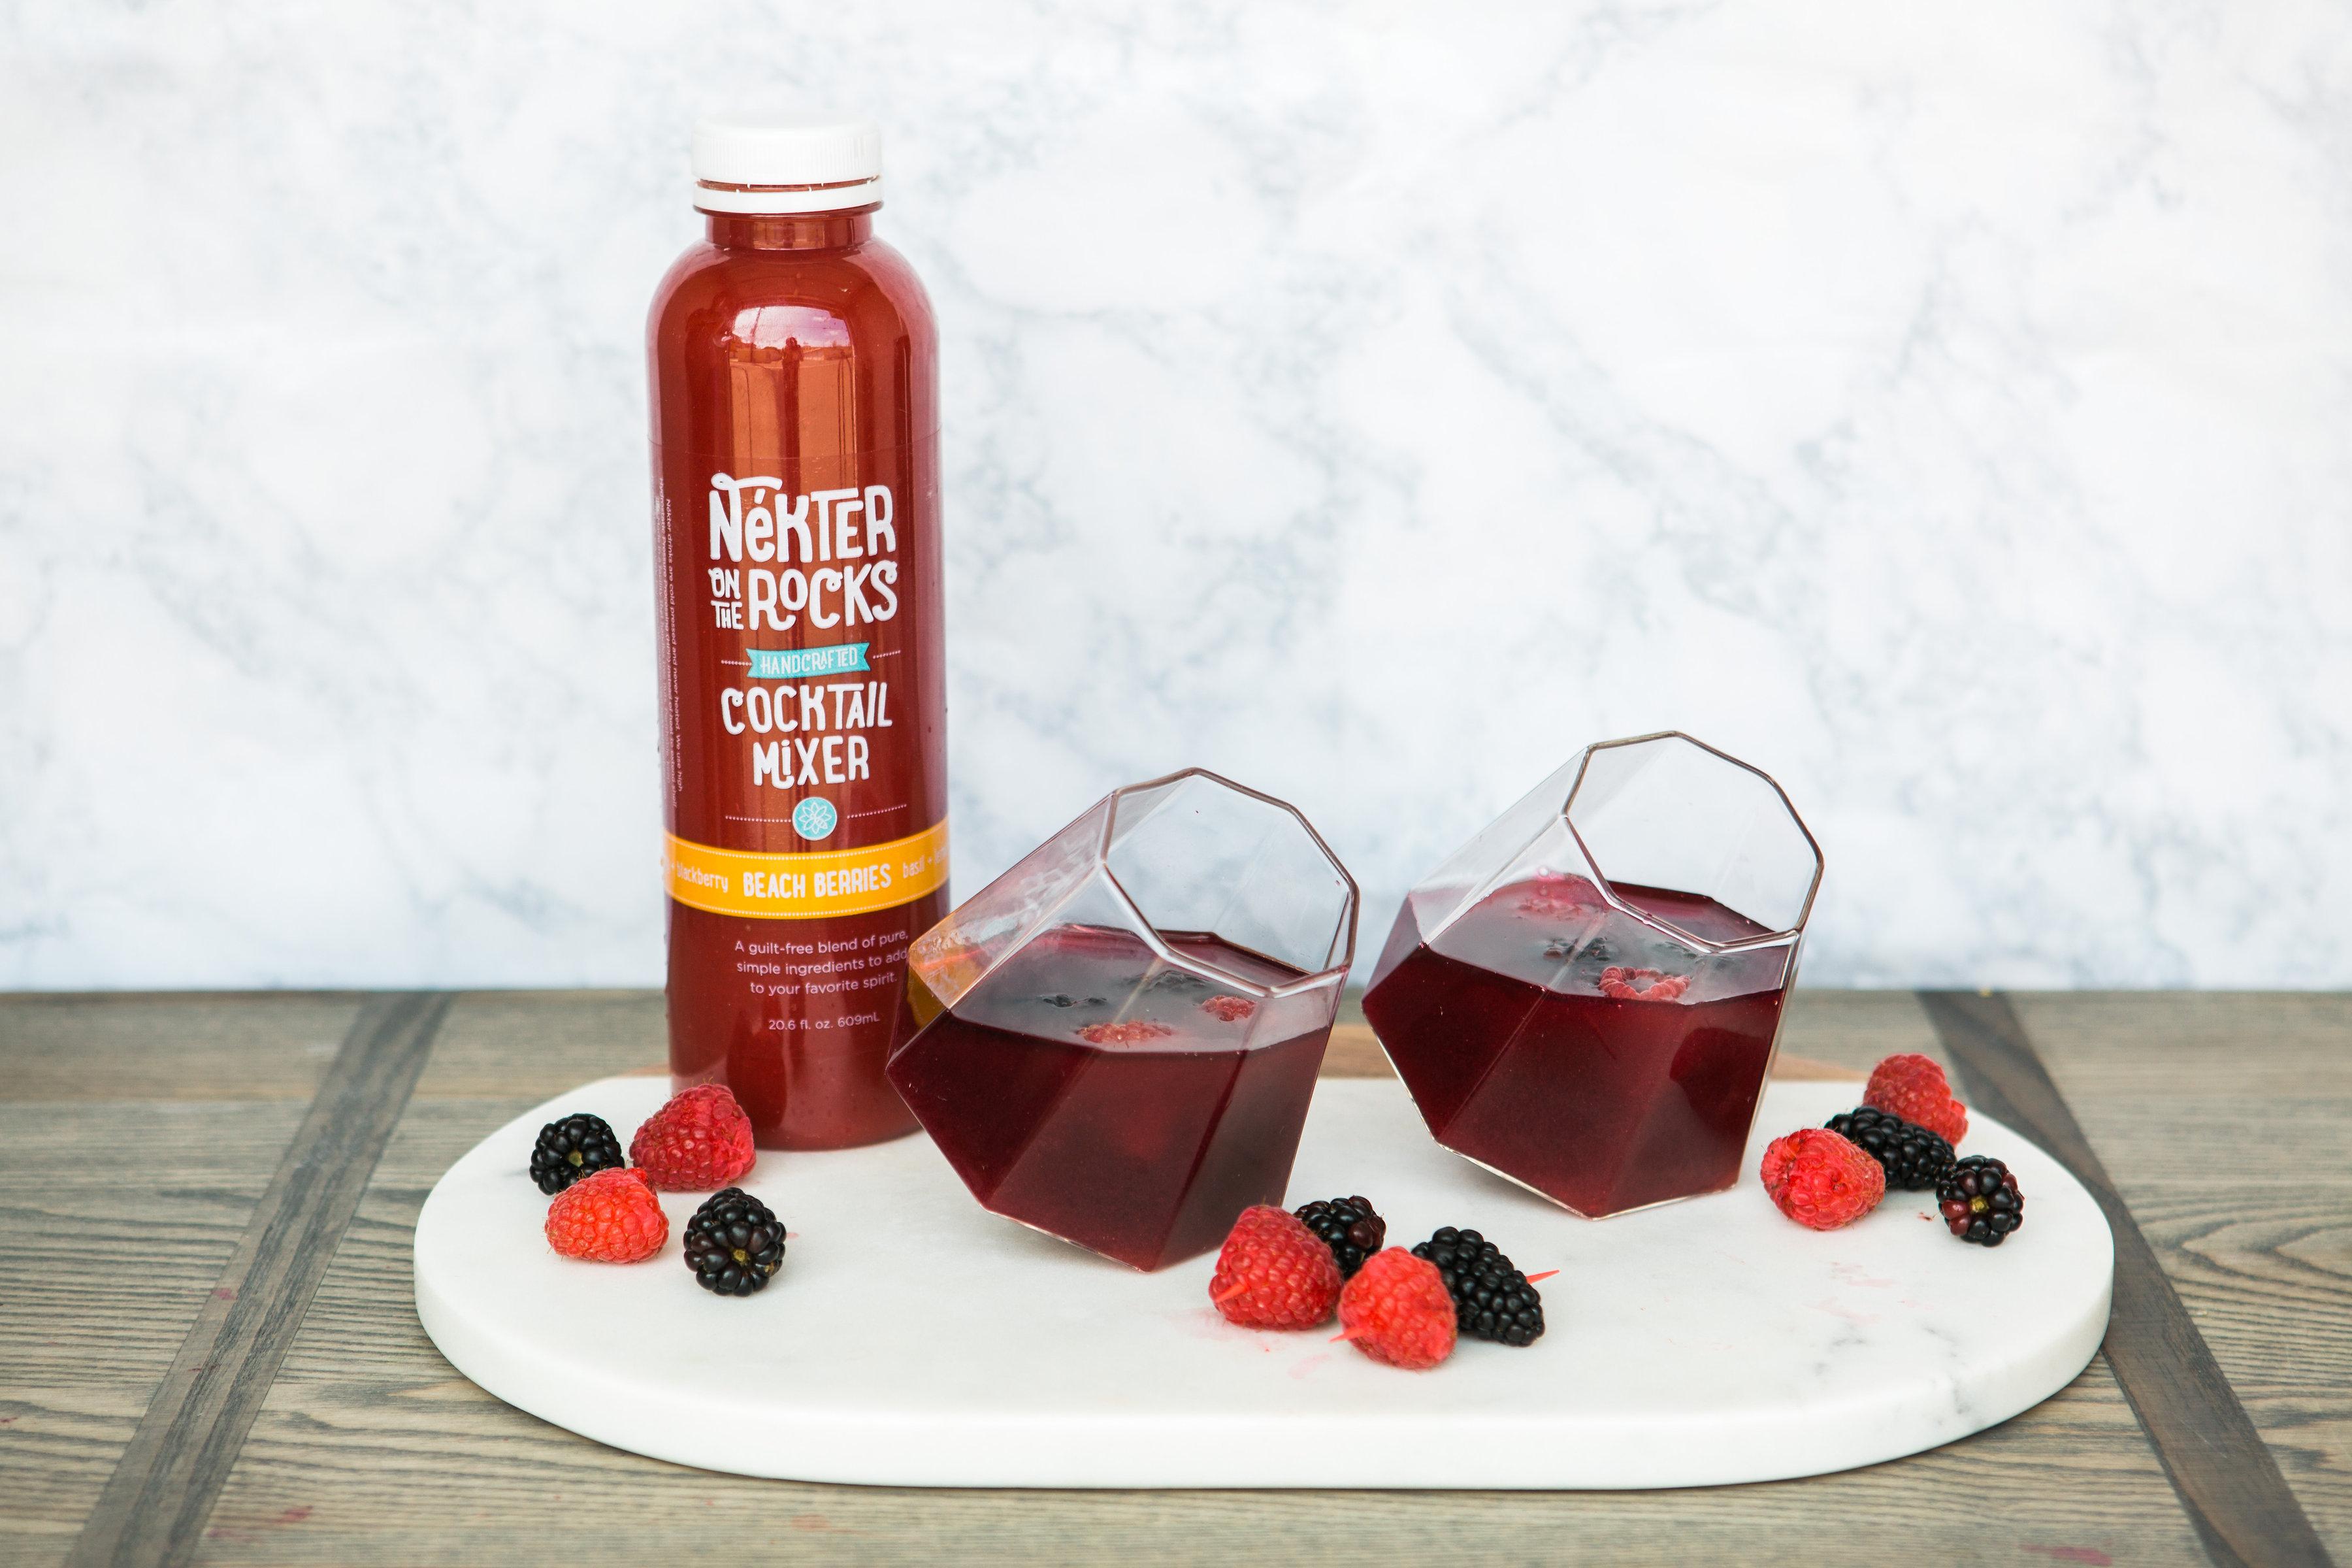 sangria recipes, red wine sangria, summer sangria recipes, sangria, healthy cocktail recipes, nekter juice bar cocktails